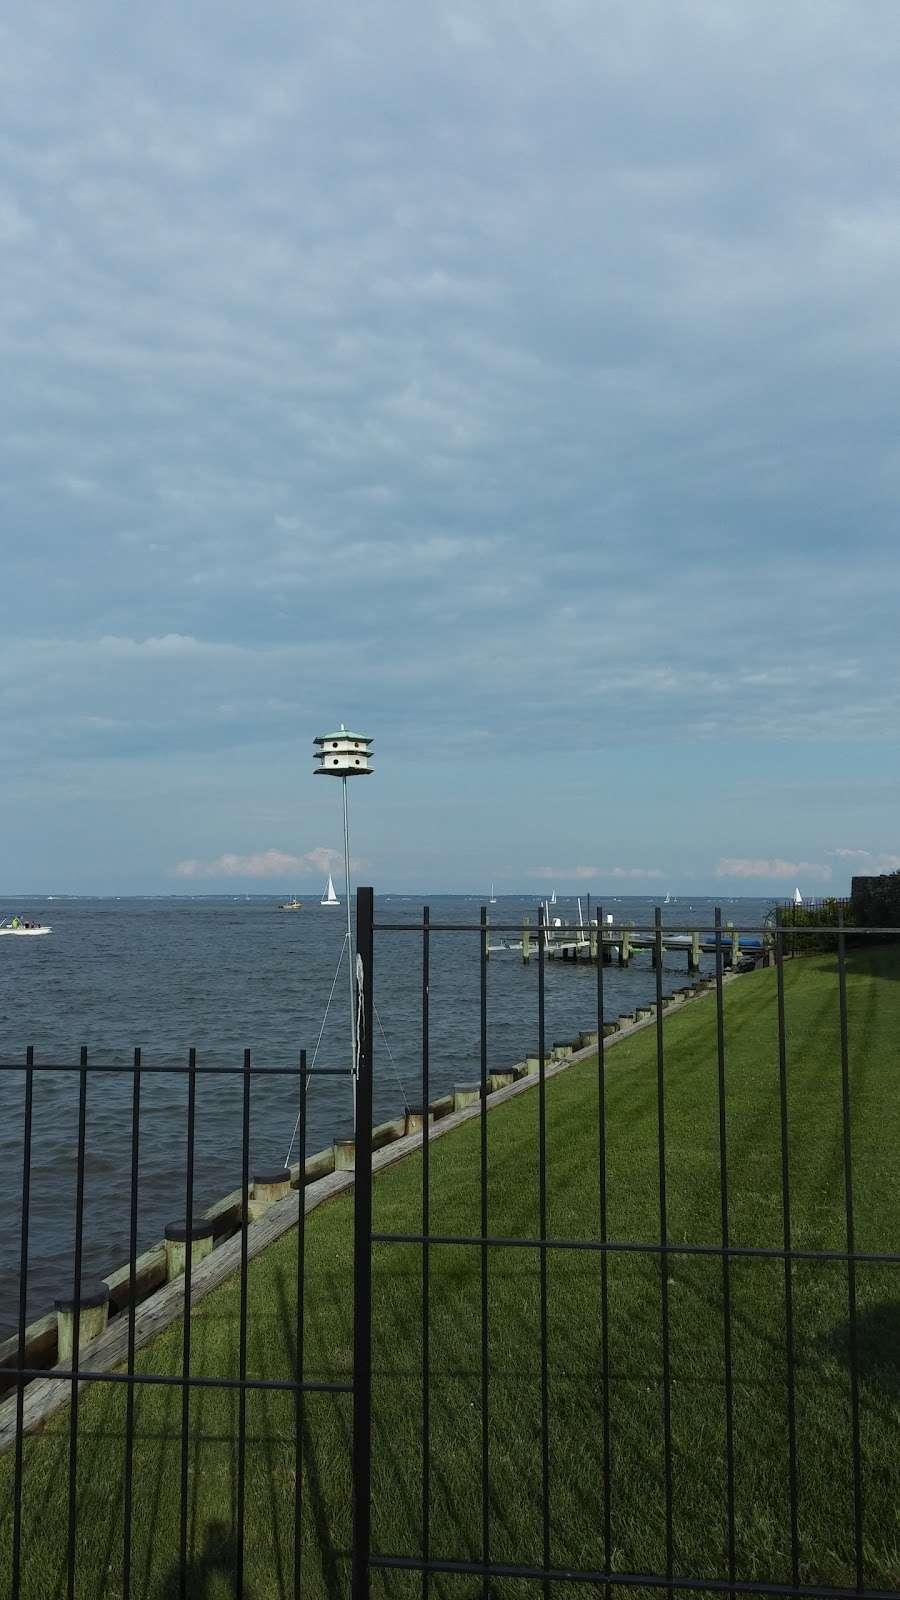 Horn Point Park - park  | Photo 10 of 10 | Address: Chesapeake Landing, Annapolis, MD 21403, USA